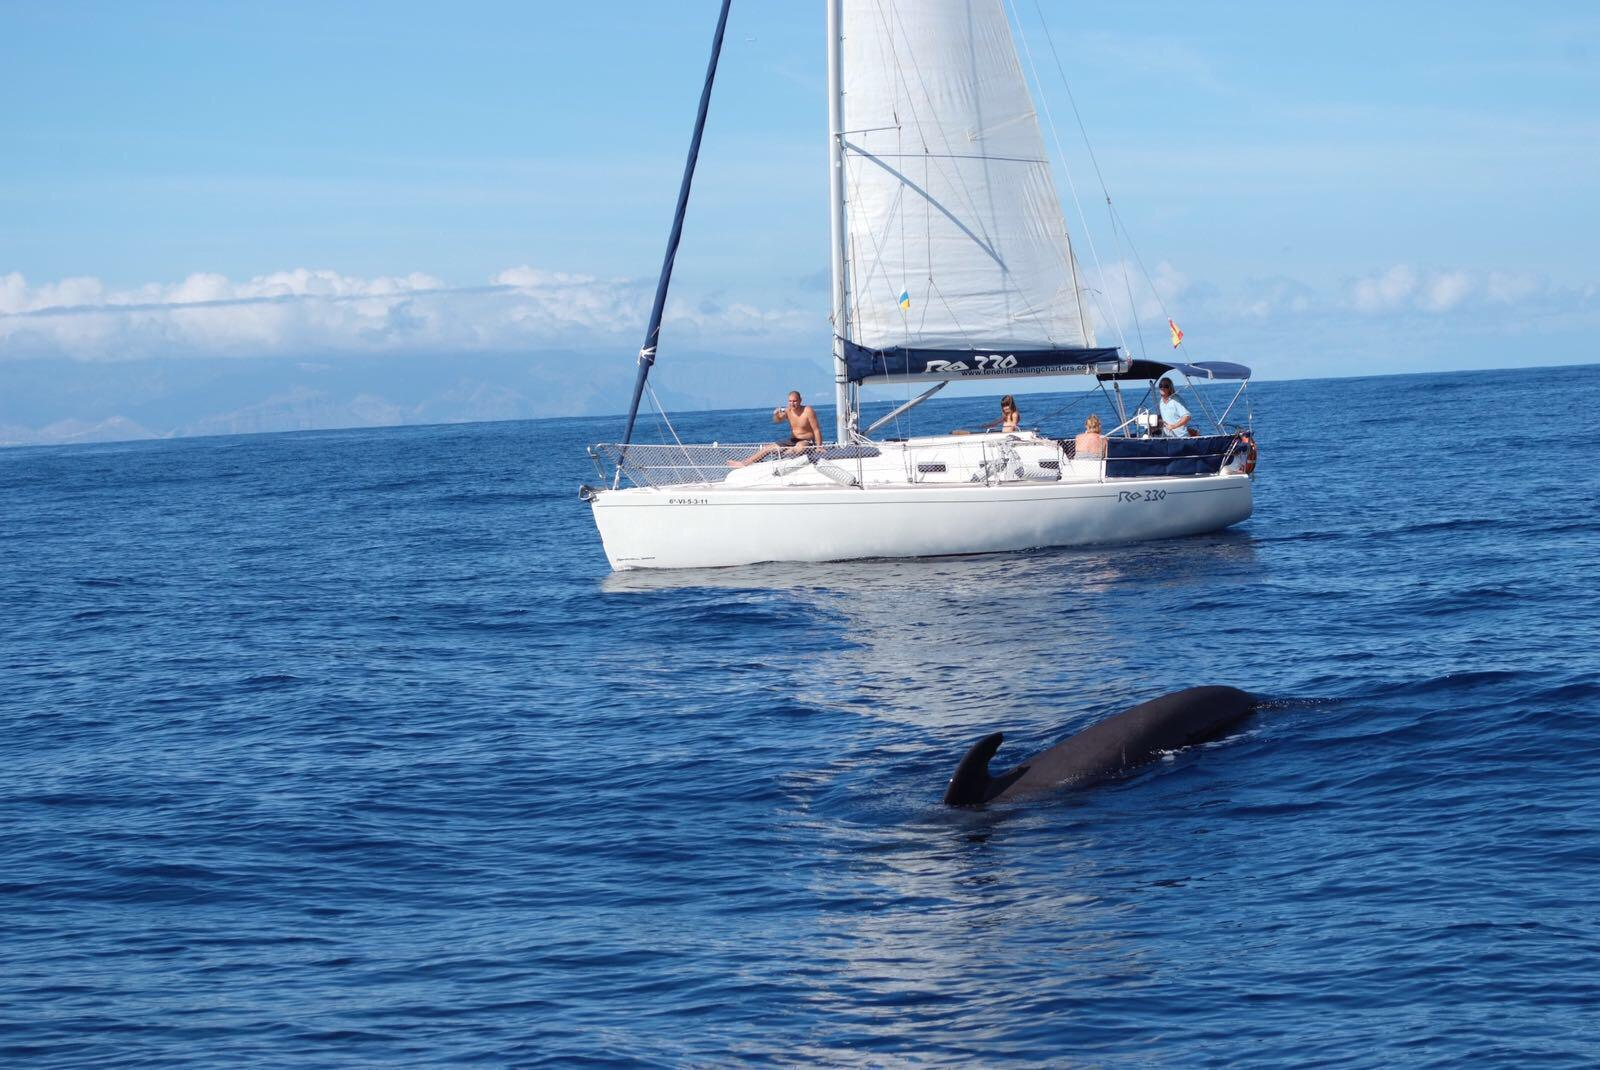 Boat Tours, Surfing, Submarine, Jetski